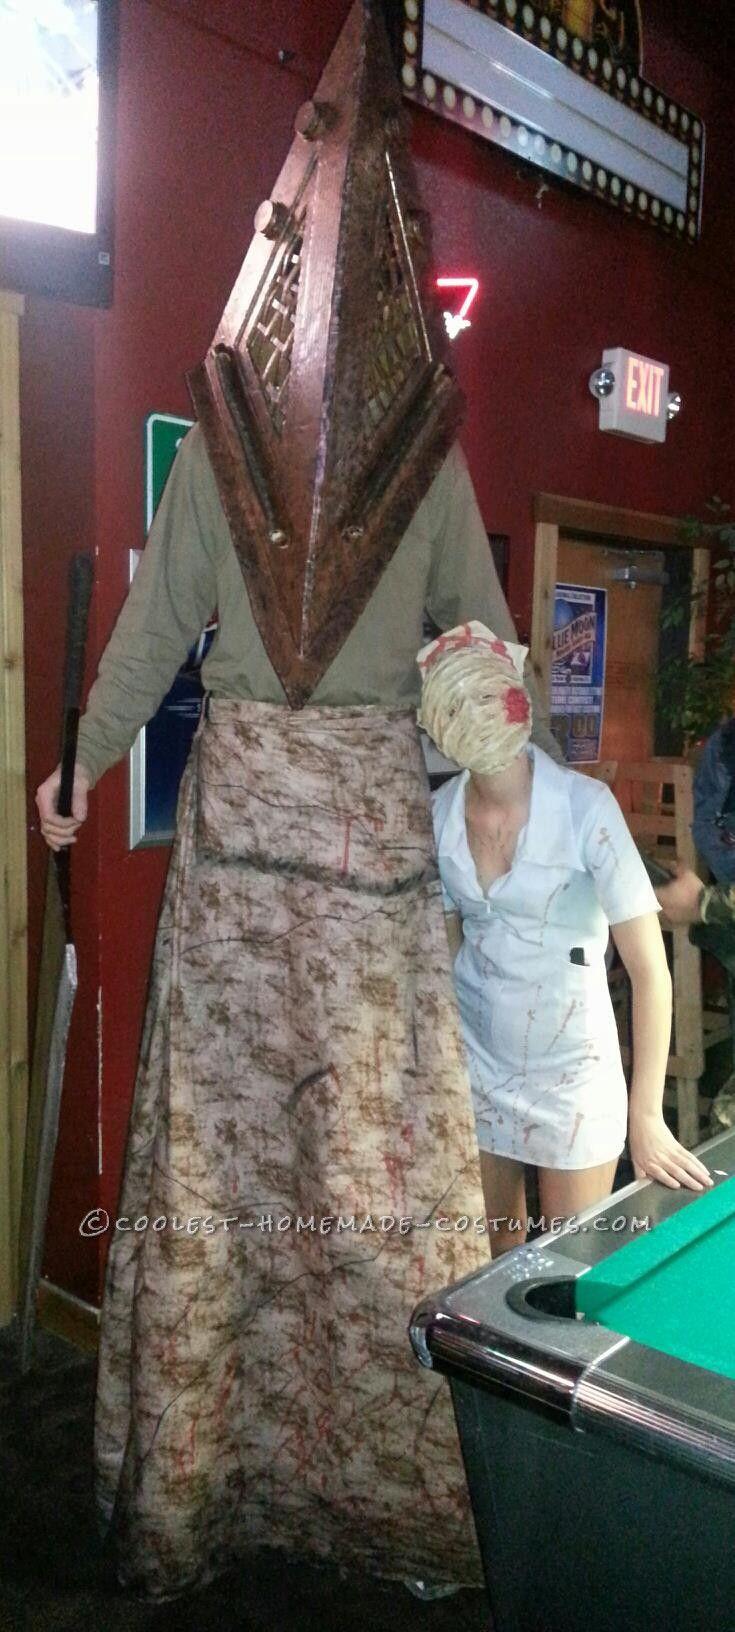 Creepy Homemade Silent Hill Couple Halloween Costume